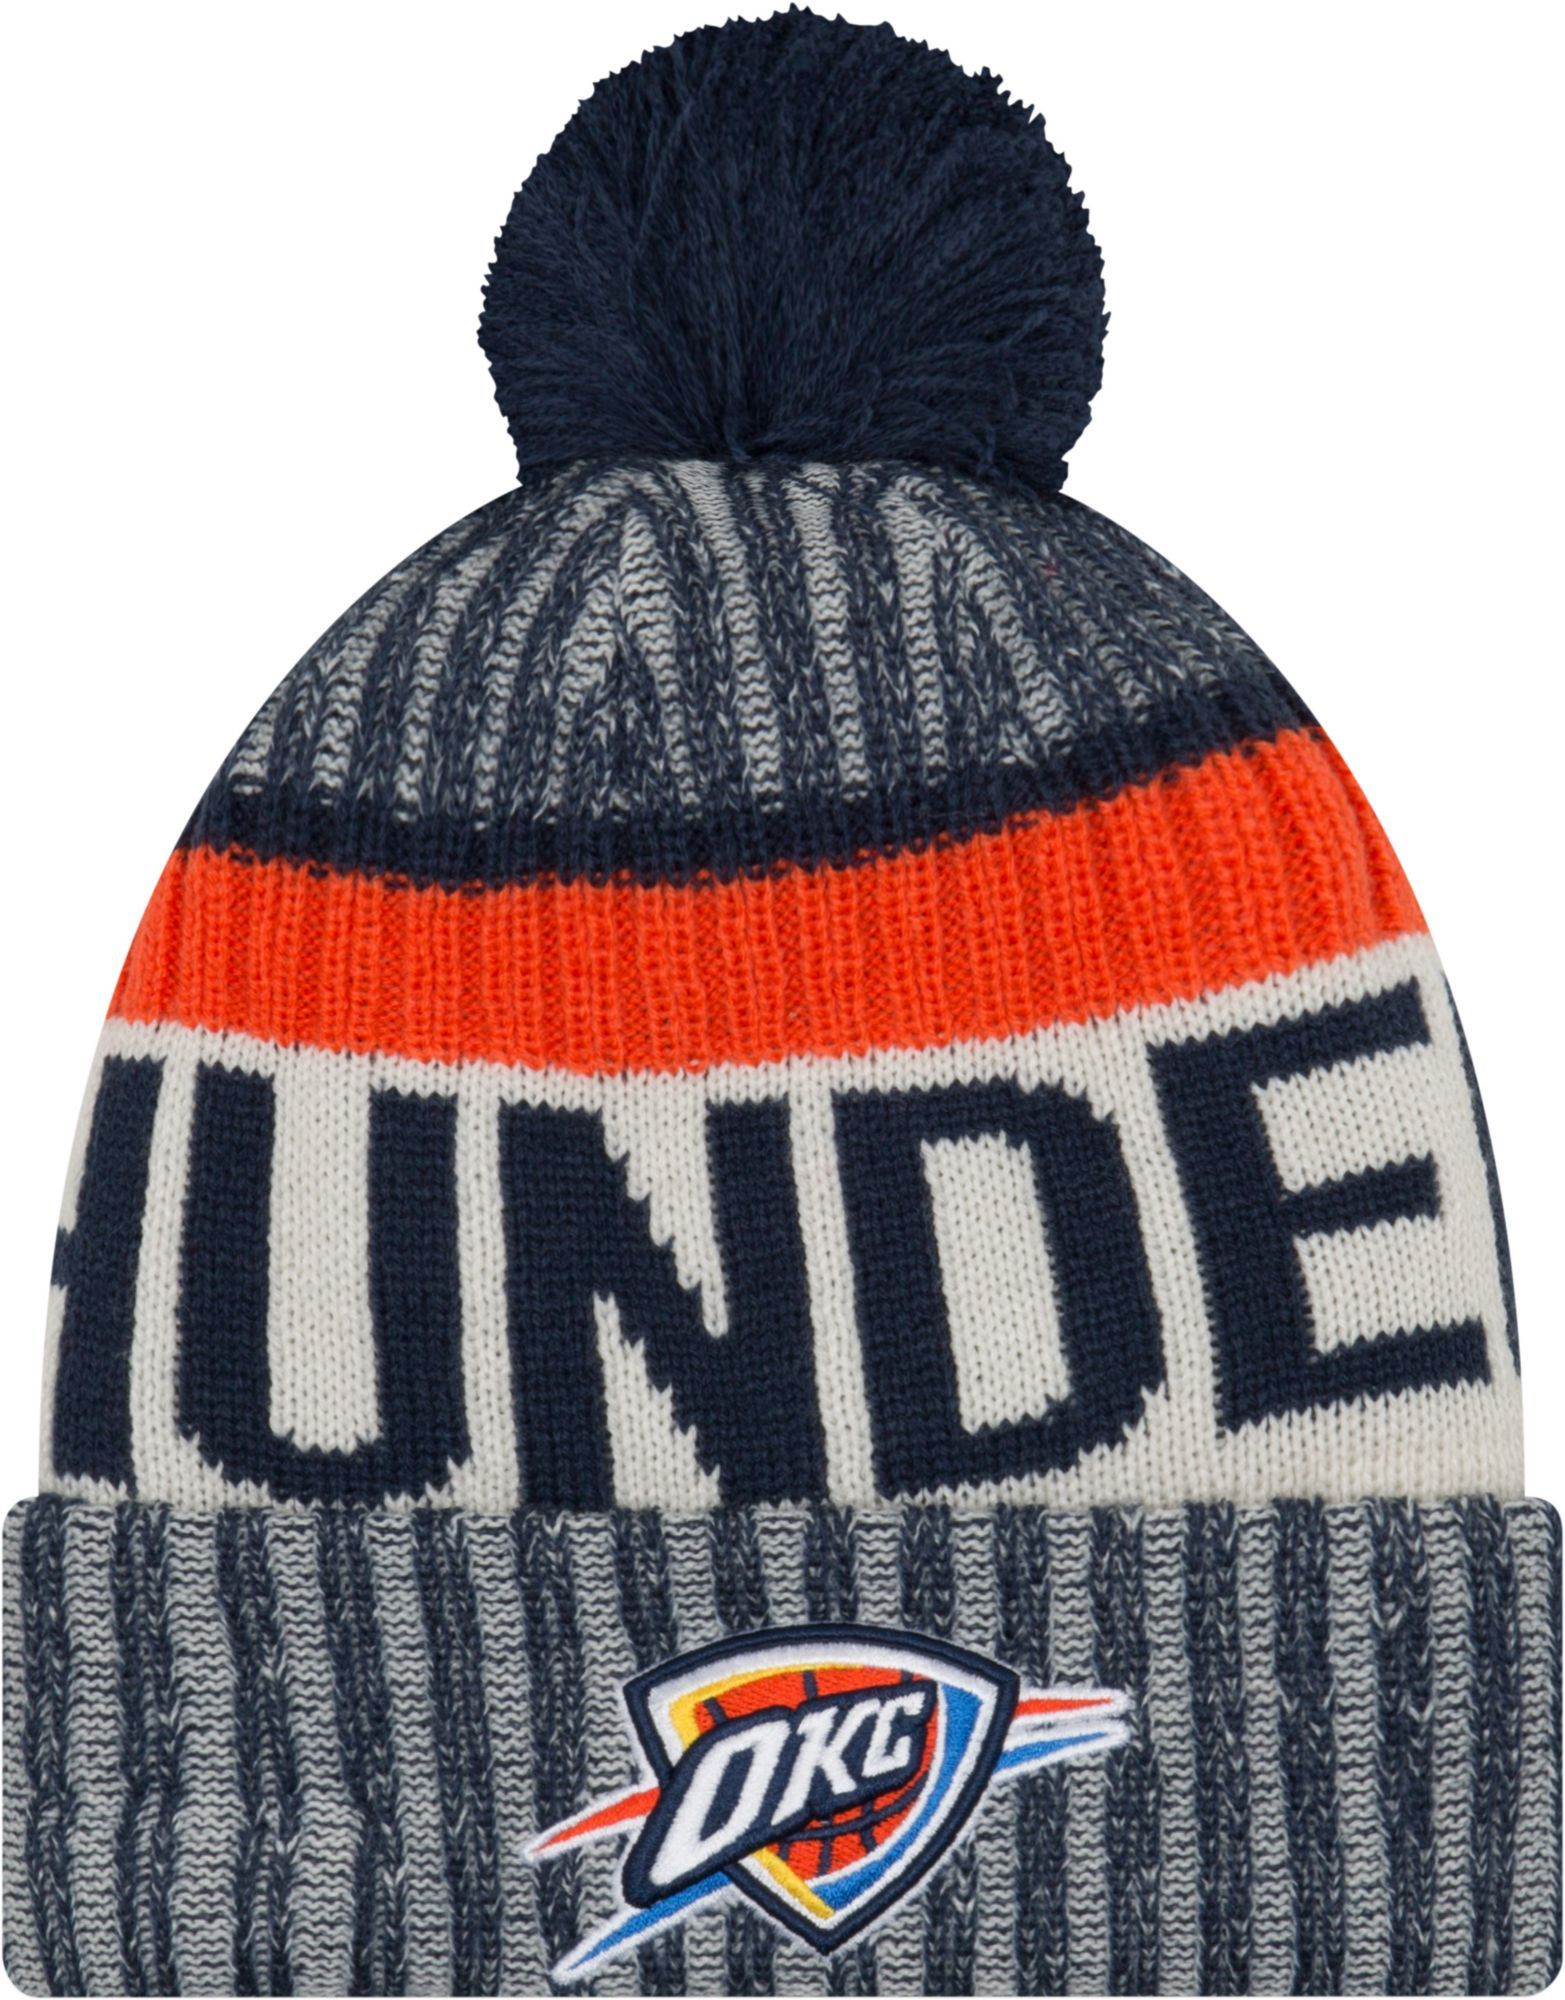 best sneakers 3f921 185b9 New Era Youth Oklahoma City Thunder Knit Hat, Kids Unisex